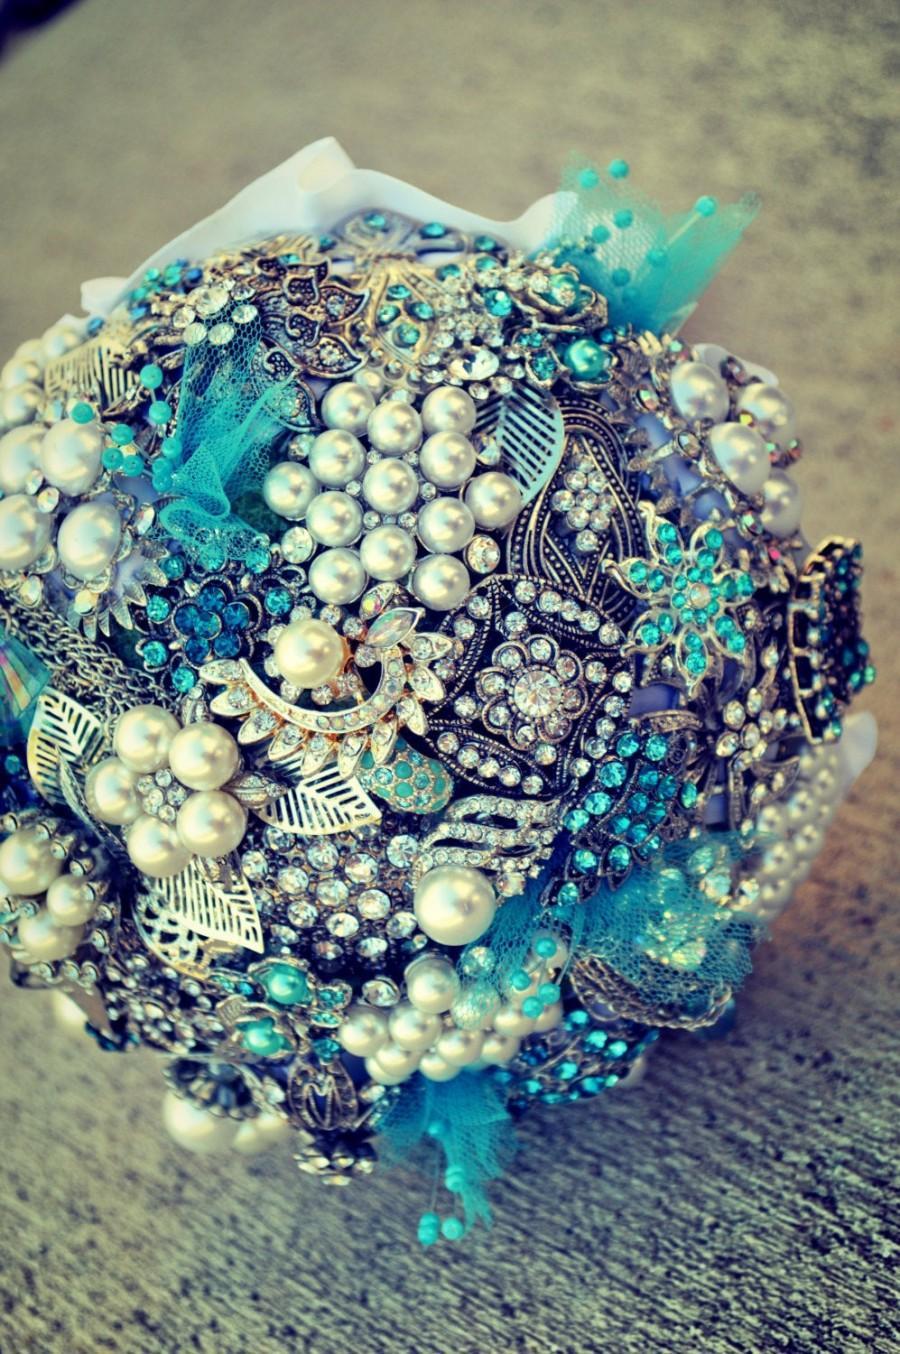 Свадьба - DEPOSIT for Custom Aqua Blue & White Pearl Brooch Bridal Wedding Bouquet